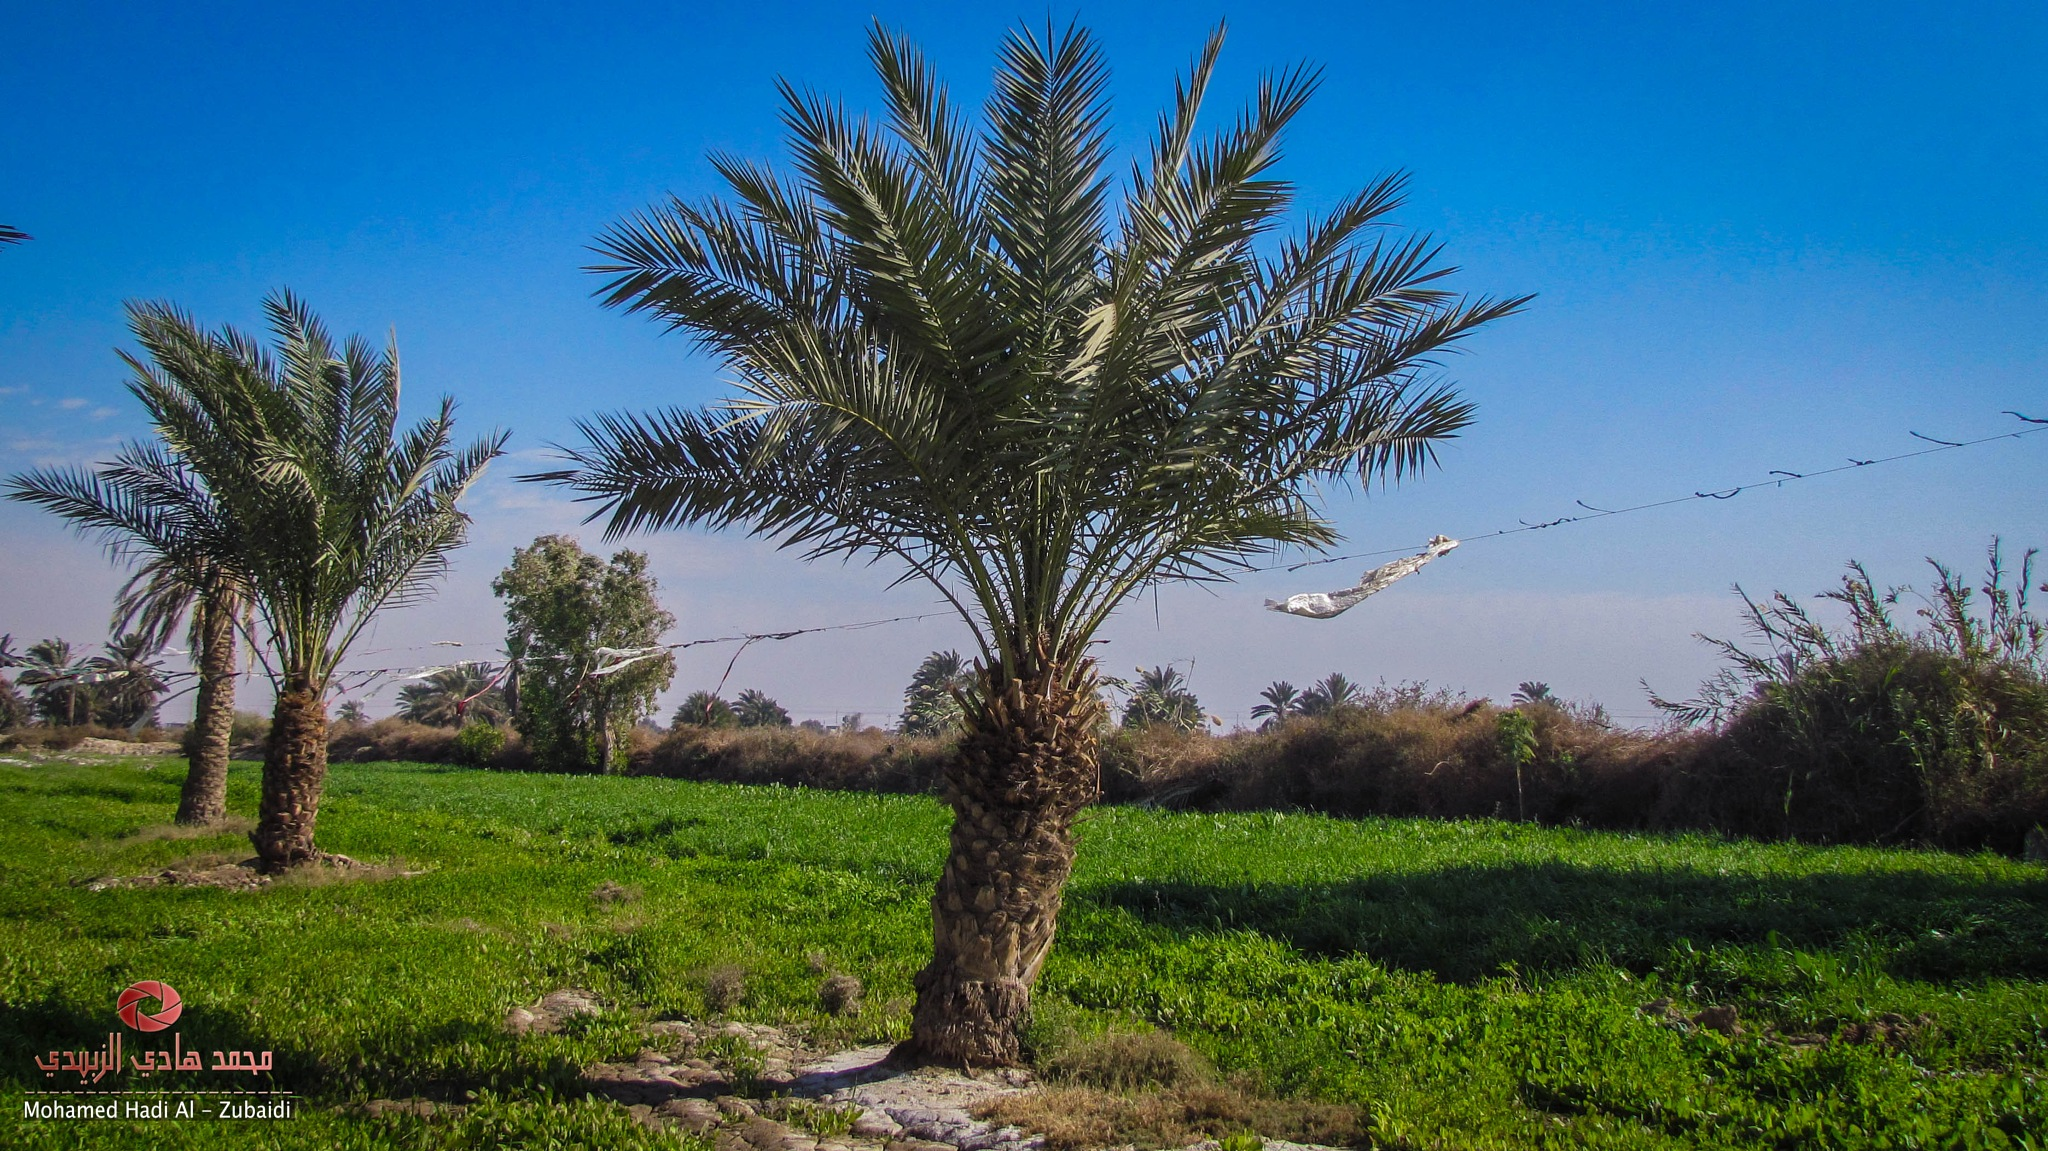 Untitled by Mohammed Hadi Al-Zubaidi